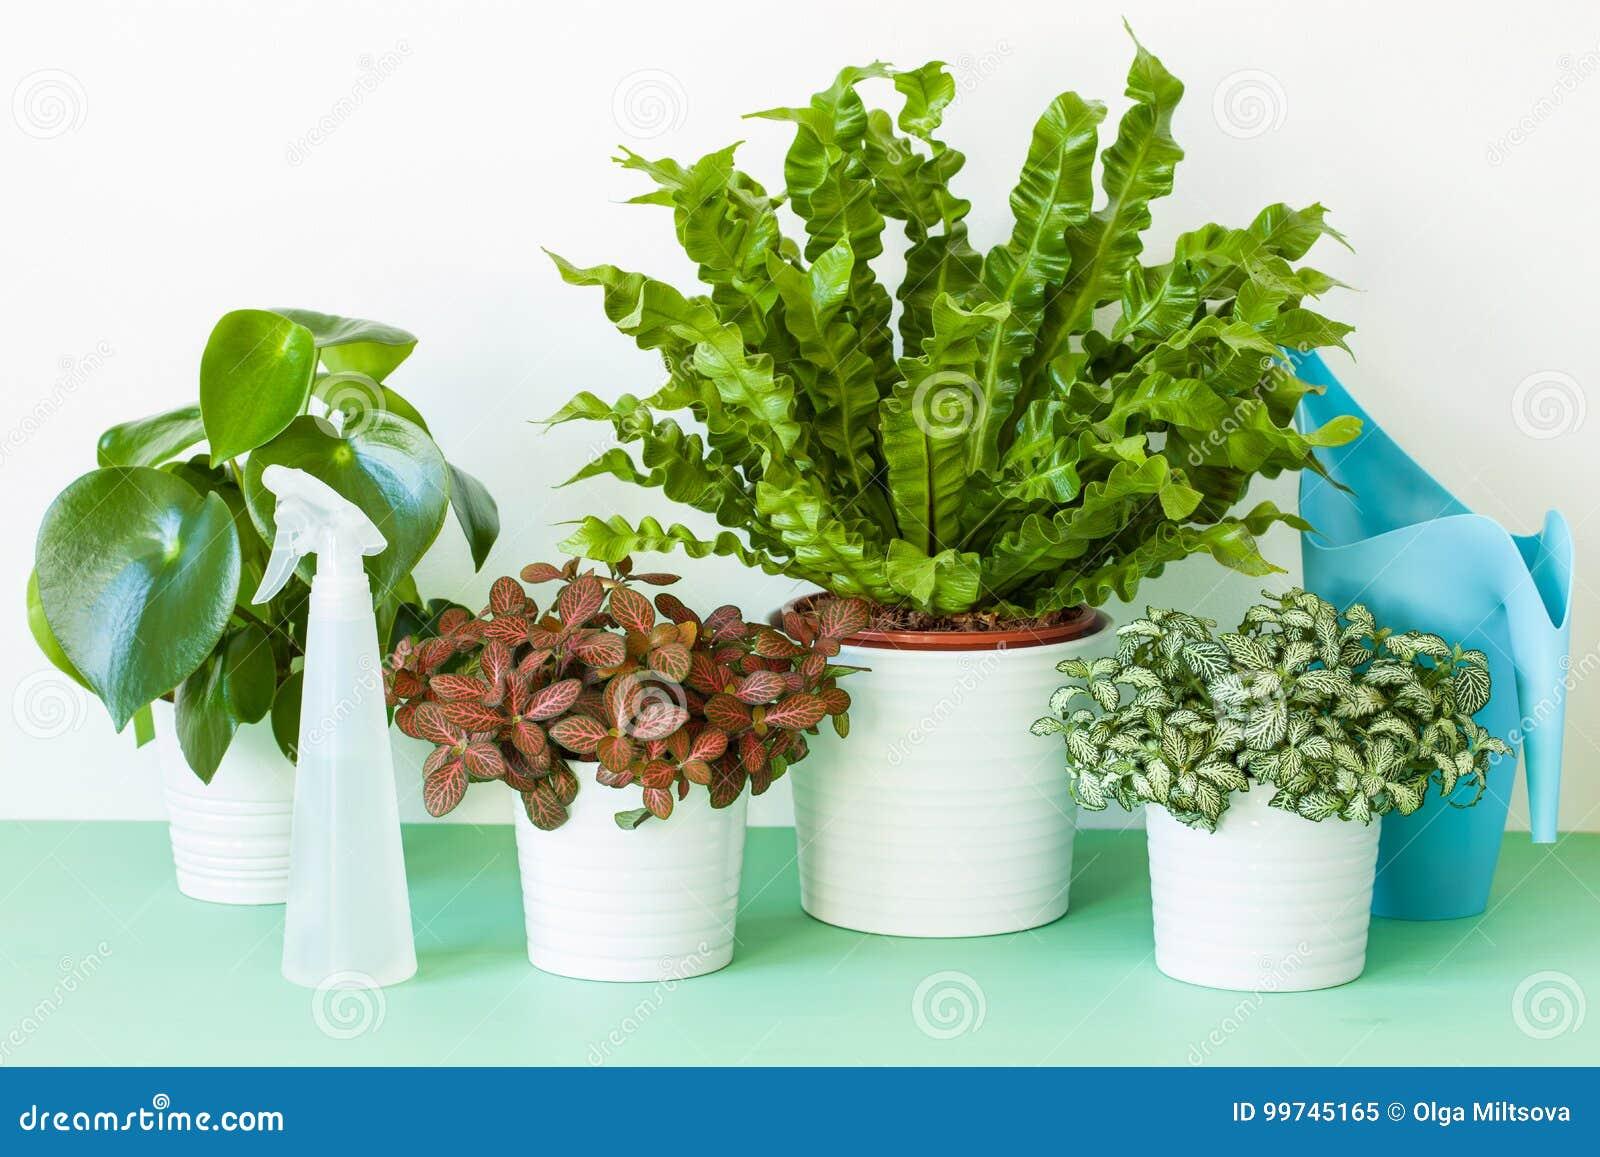 Houseplant Asplenium Nidus, Peperomia And onia In ... on licorice fern, alocasia house plant, ostrich fern, cyathea cooperi, asplenium australasicum, sensitive fern, philodendron house plant, spanish moss house plant, peperomia house plant, philodendron gigas, philodendron hederaceum, asplenium antiquum, asplenium trichomanes, asplenium serratum, hart's-tongue fern, justicia brandegeeana, giant salvinia, ficus elastica, spathiphyllum house plant, sansevieria trifasciata, cinnamon fern, boston fern, fittonia house plant, philodendron domesticum, monstera house plant,